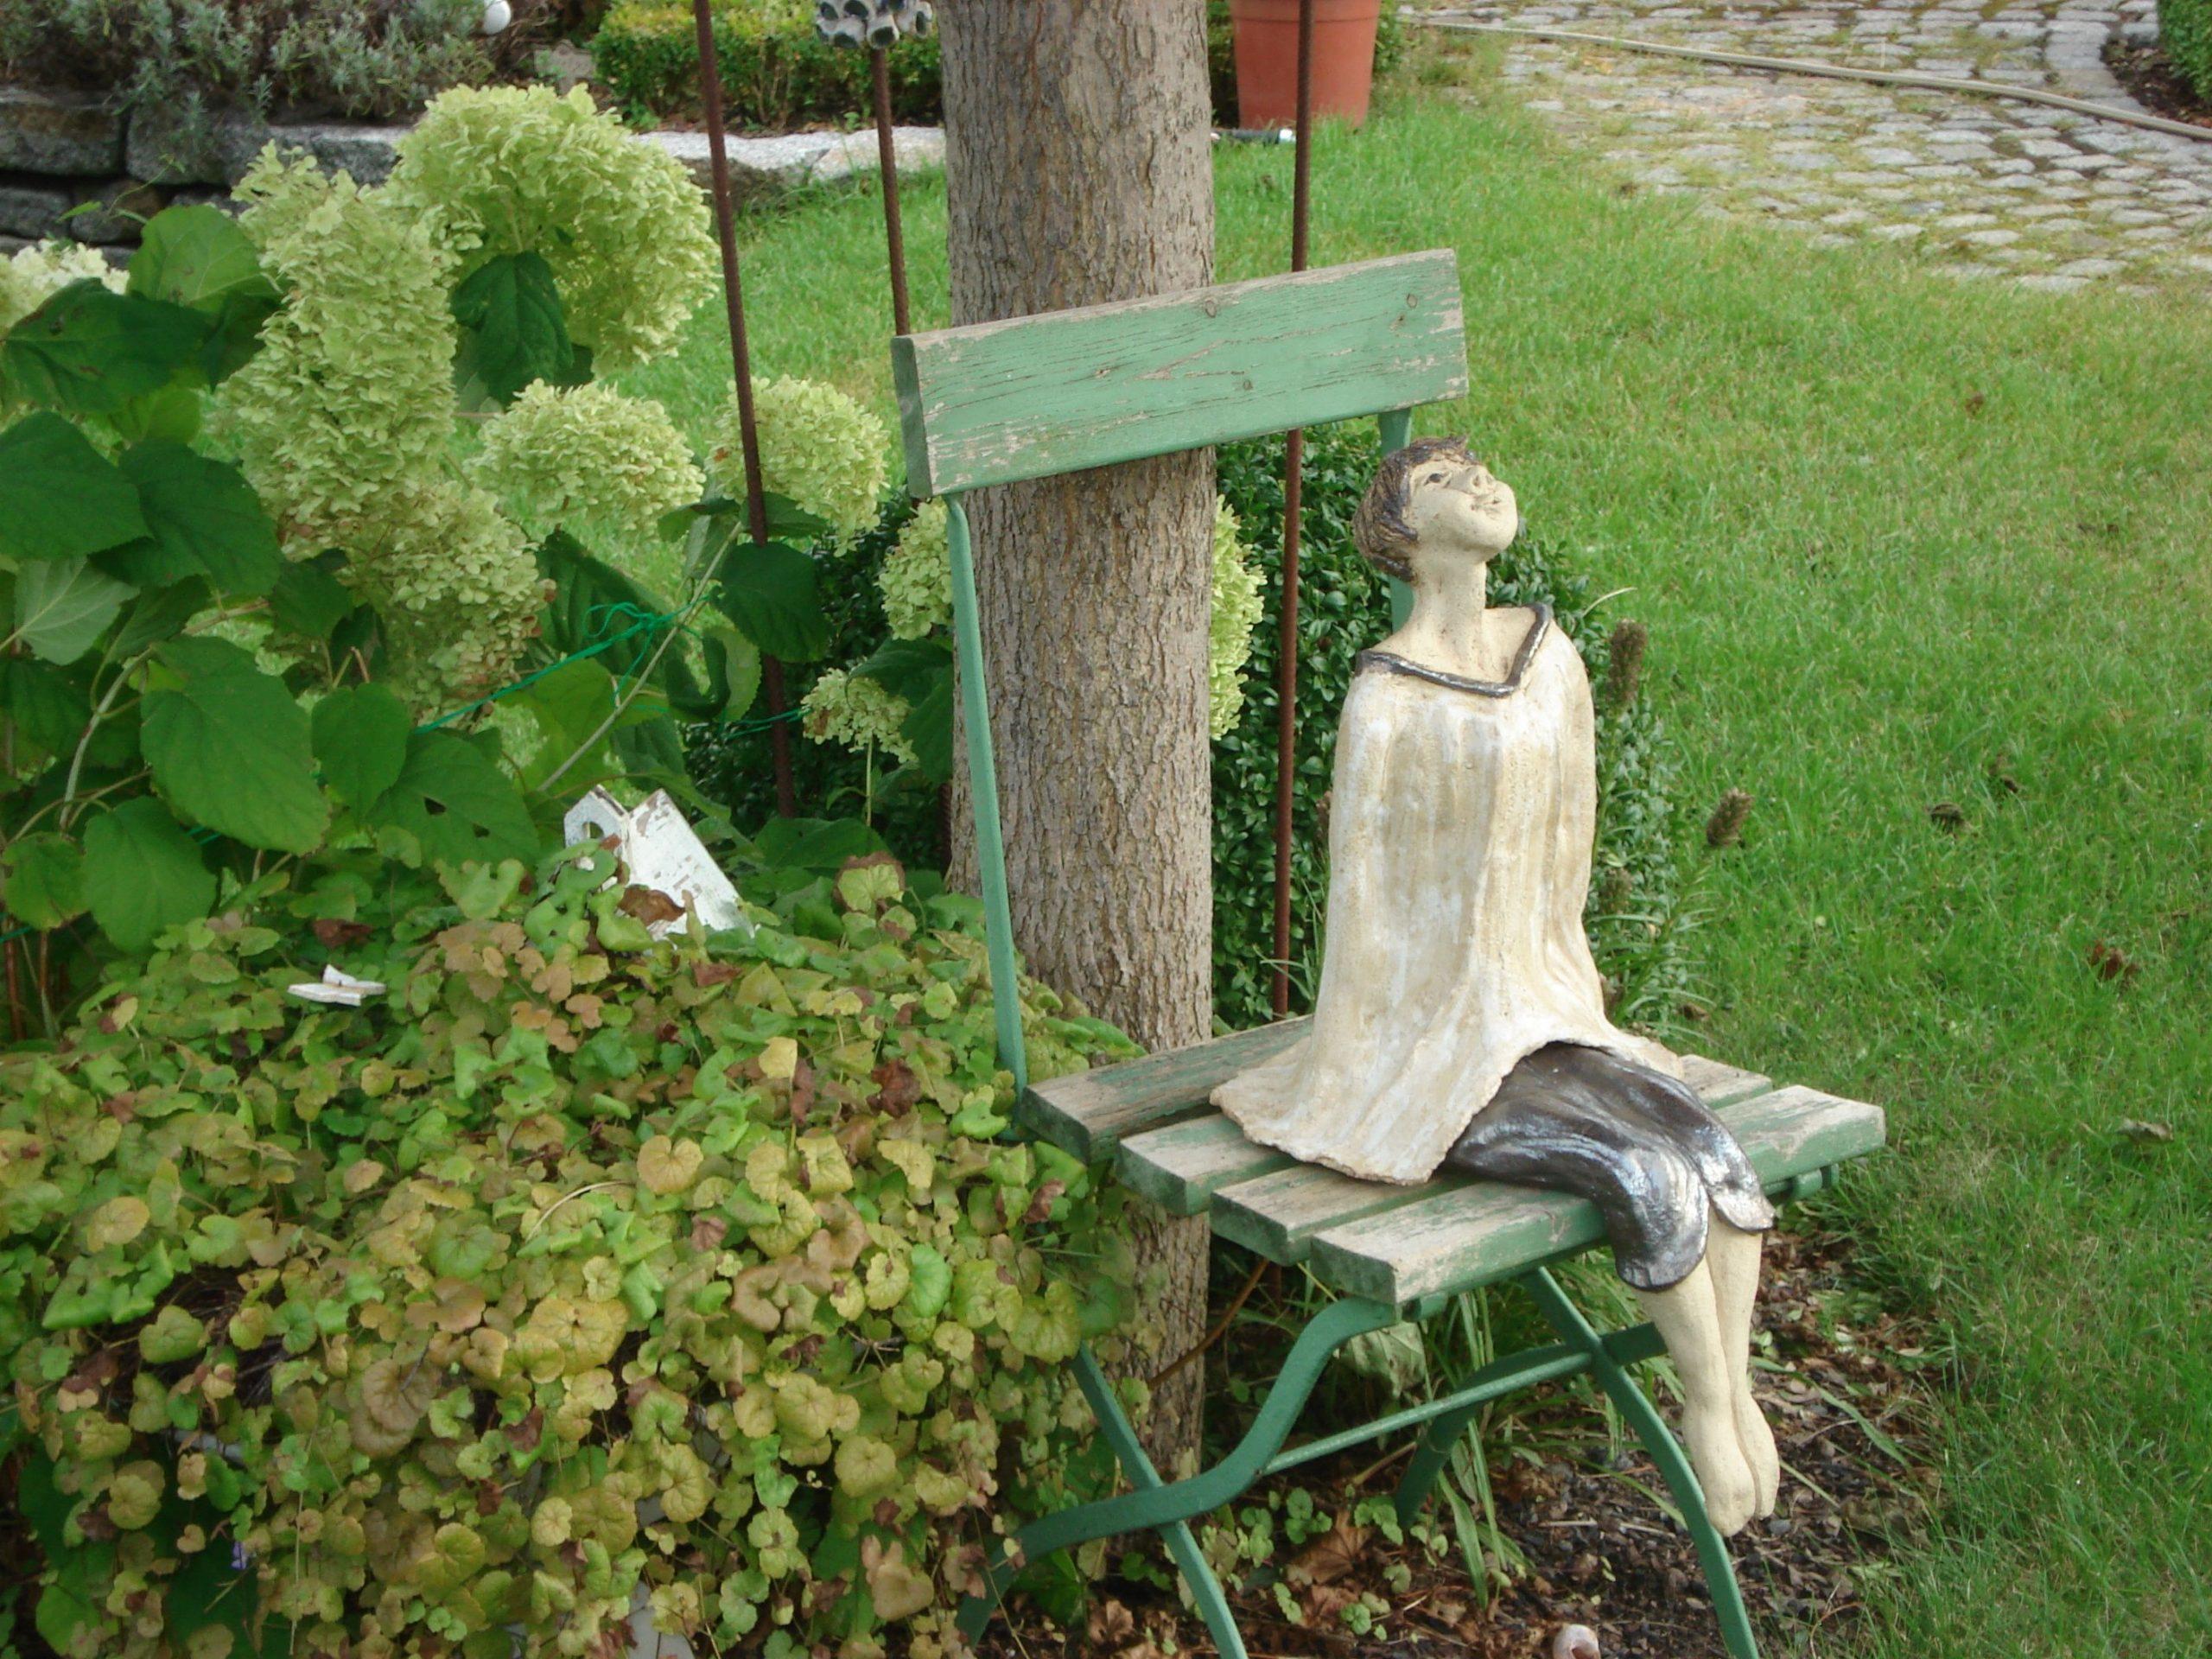 Full Size of Skulpturen Garten Gartenskulpturen Stein Aus Modern Gartenskulptur Edelstahl Stein Italien Buddha Edelstahl Figur Brunnen Im Kinderspielhaus Gartenüberdachung Garten Skulpturen Garten